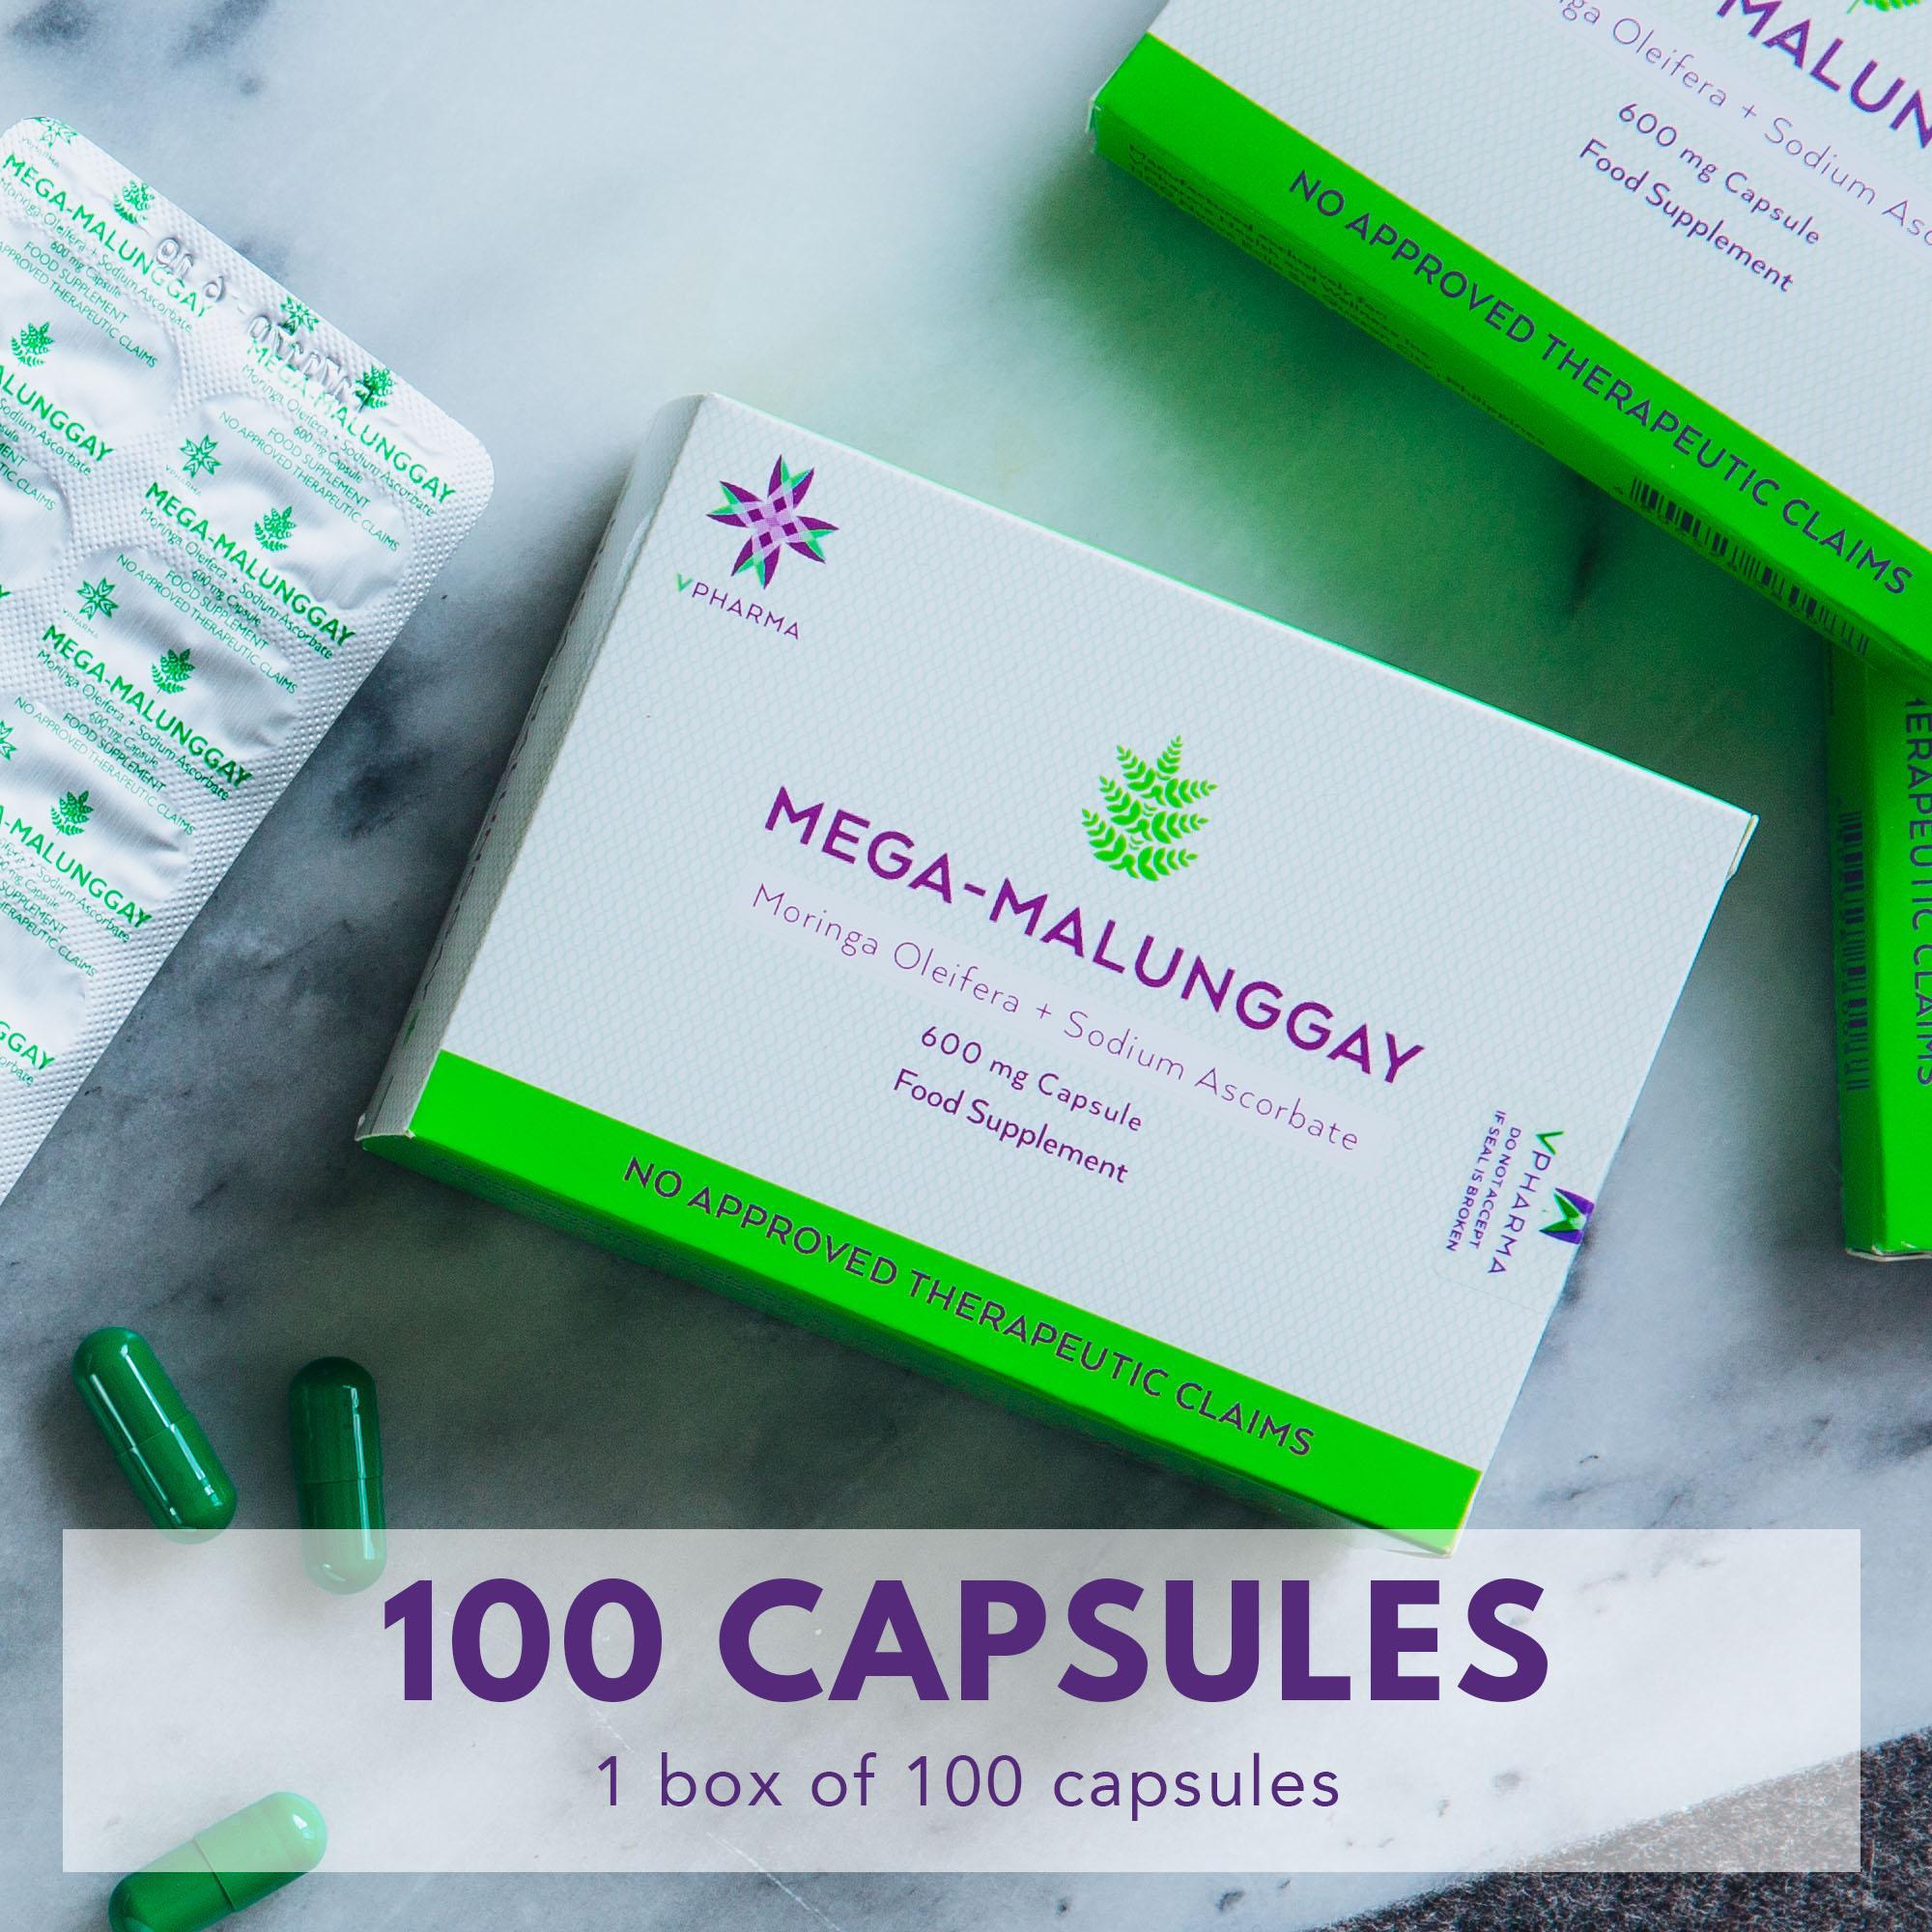 Vpharma Mega Malung Capsules Moringa Oleifera Sodium Ascorbate 100